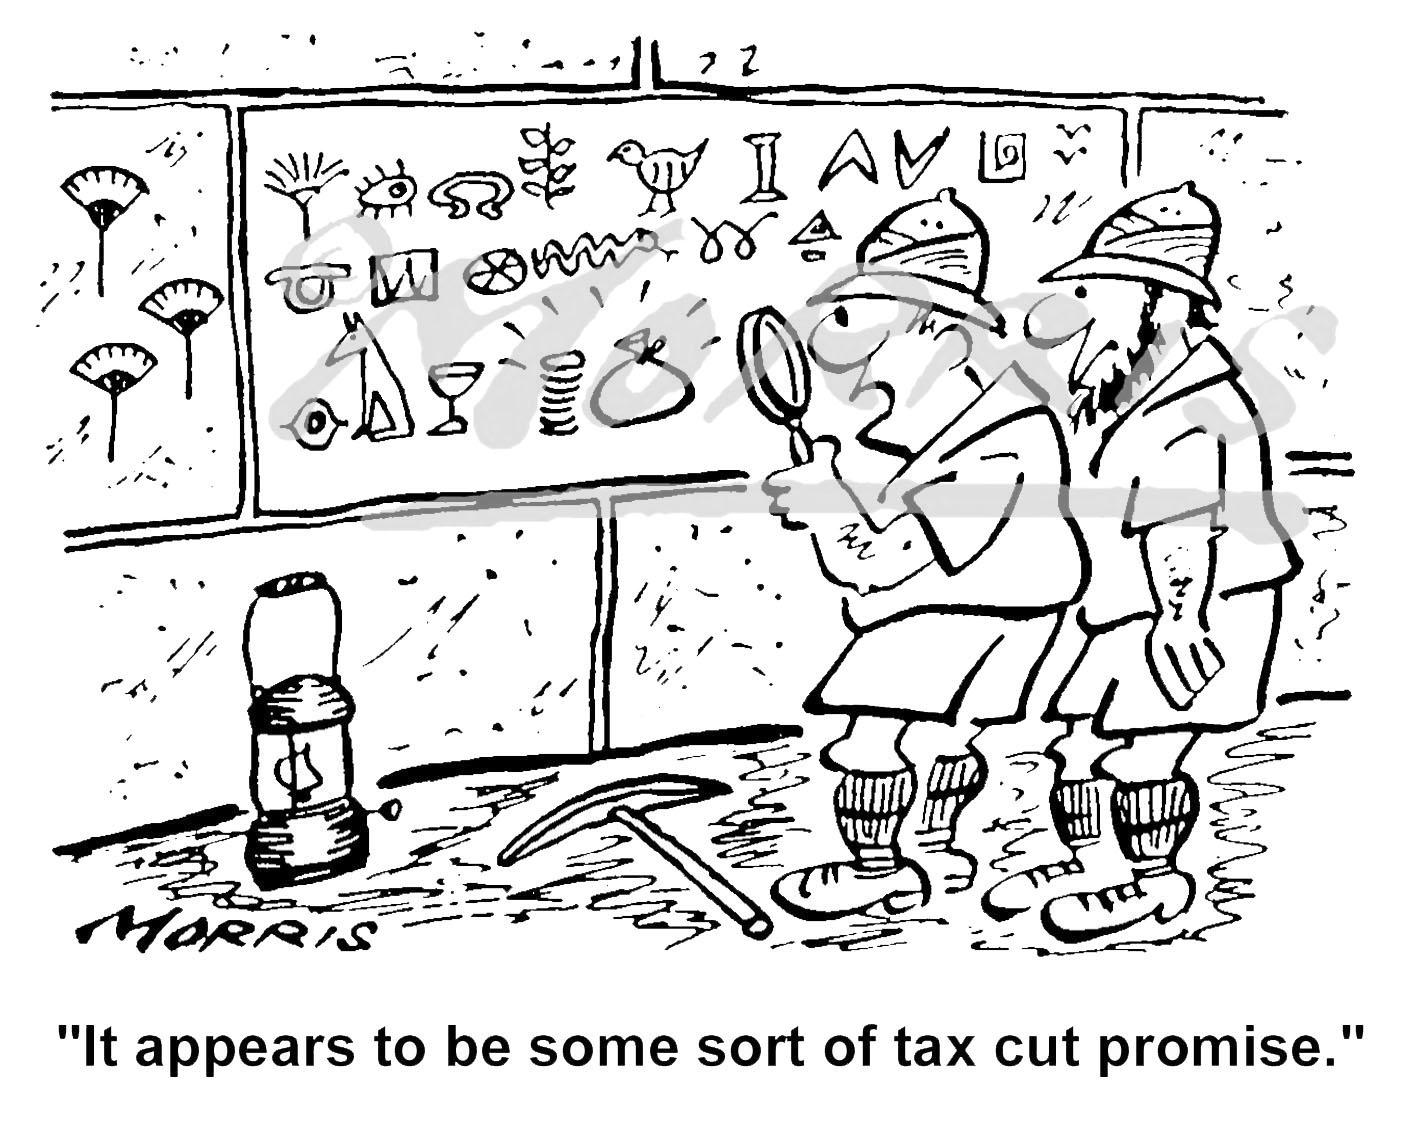 Accountancy cartoon, Auditor cartoon, Accountant cartoon, Tax cartoon – Ref: 3486bw